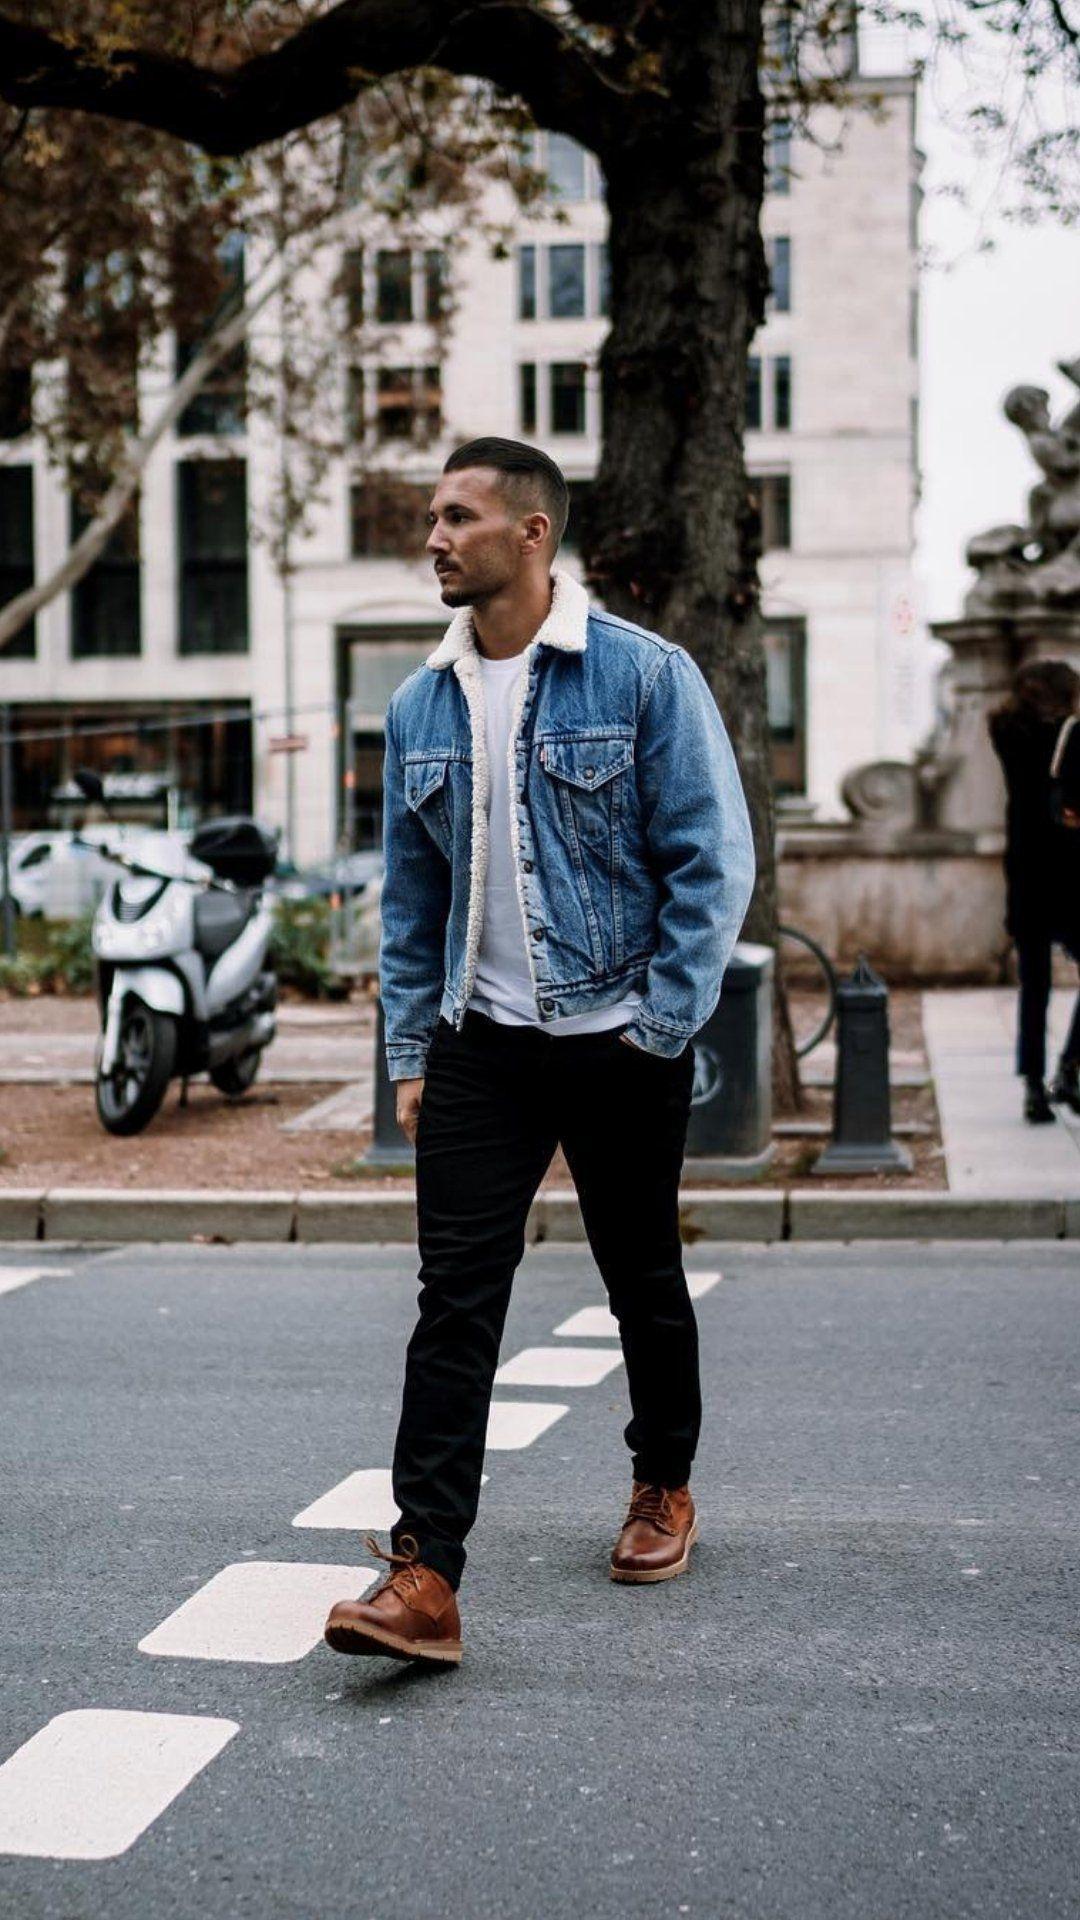 12 Best Stuff I want images | Mens fashion:__cat__, Adidas